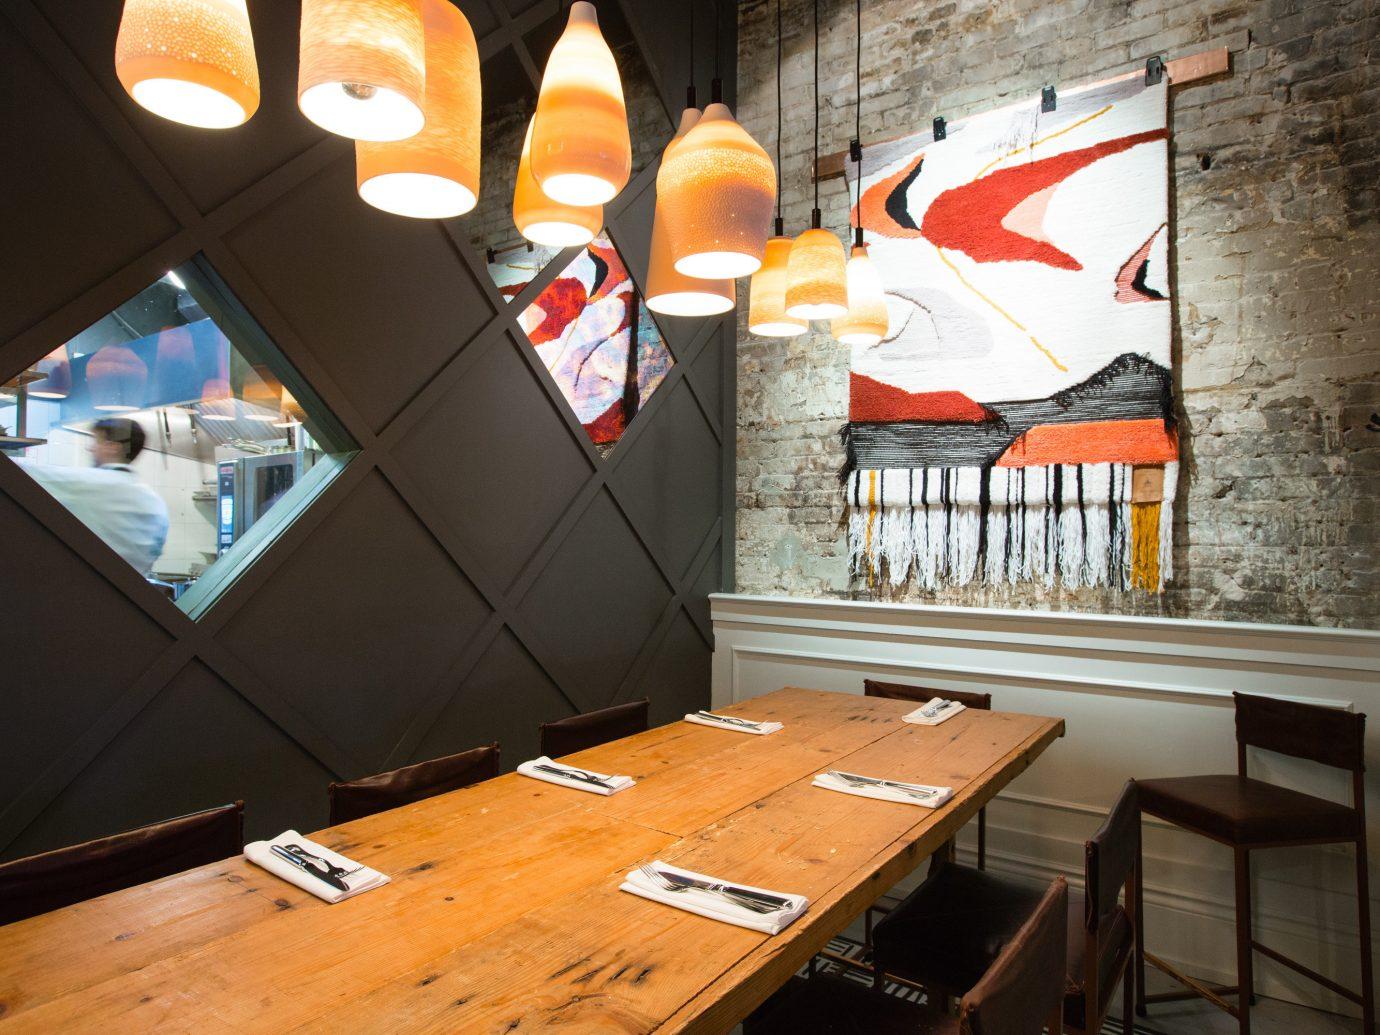 Food + Drink indoor room wall art interior design Design living room